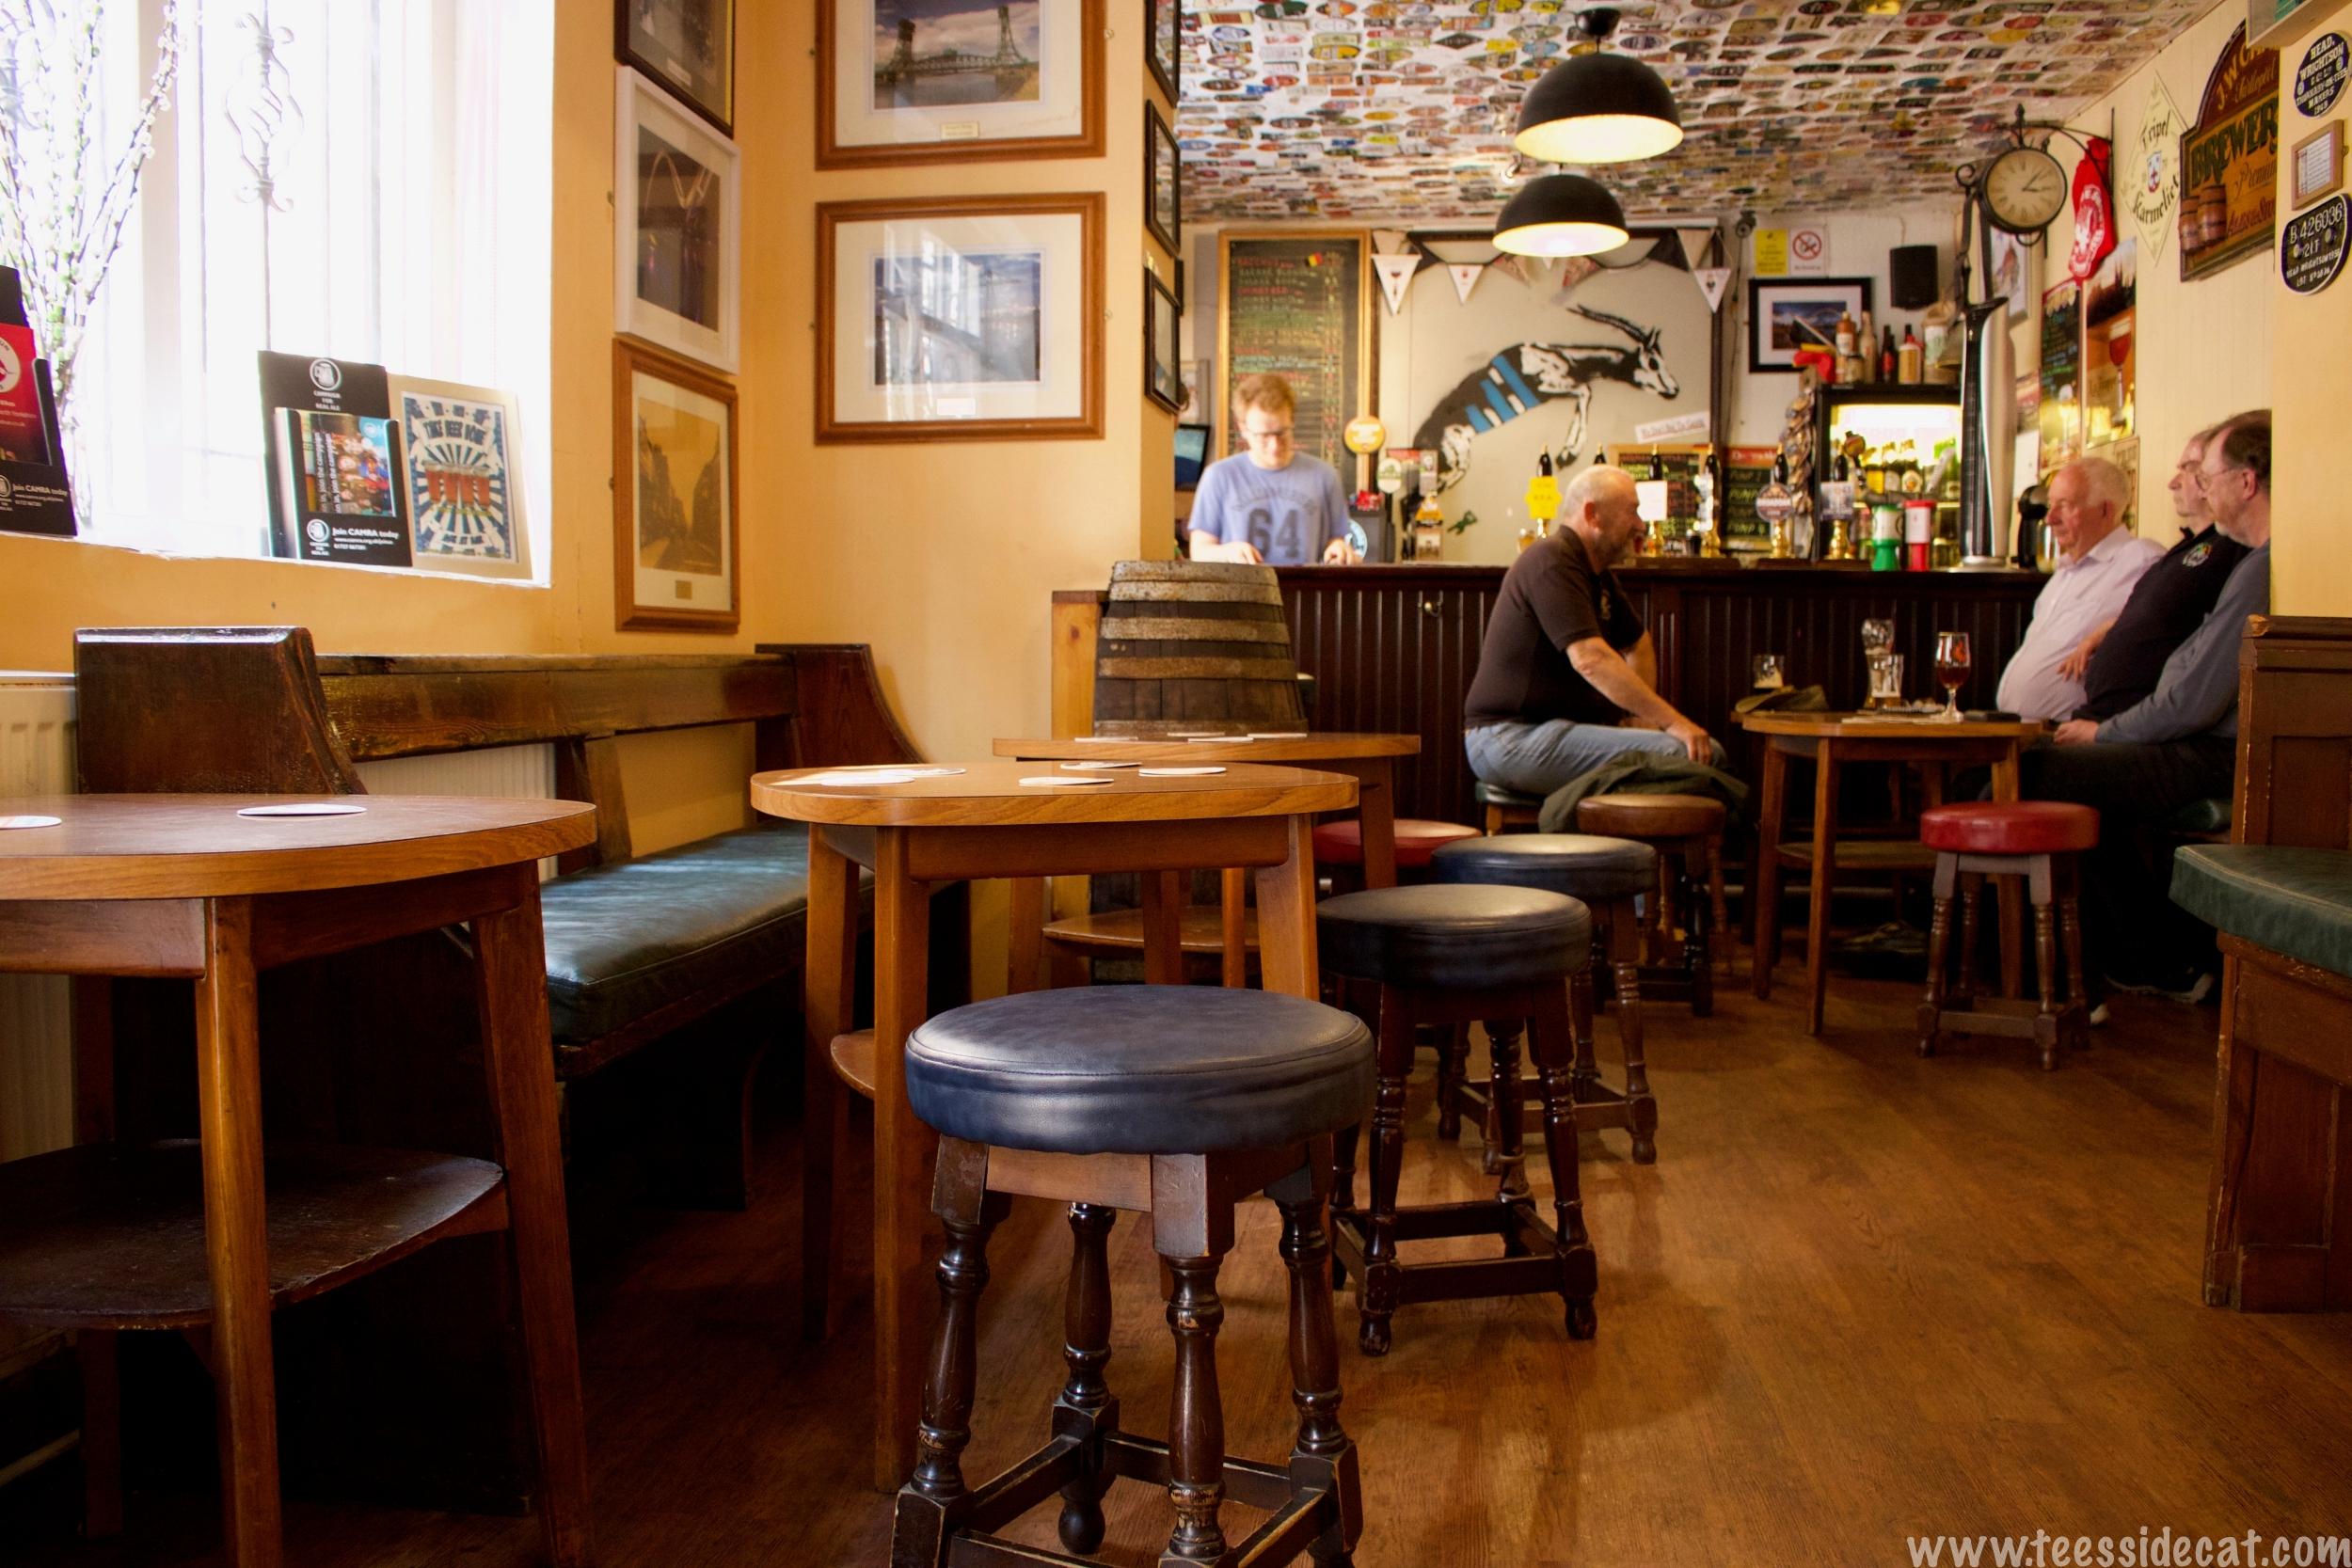 Peaceful pub afternoons